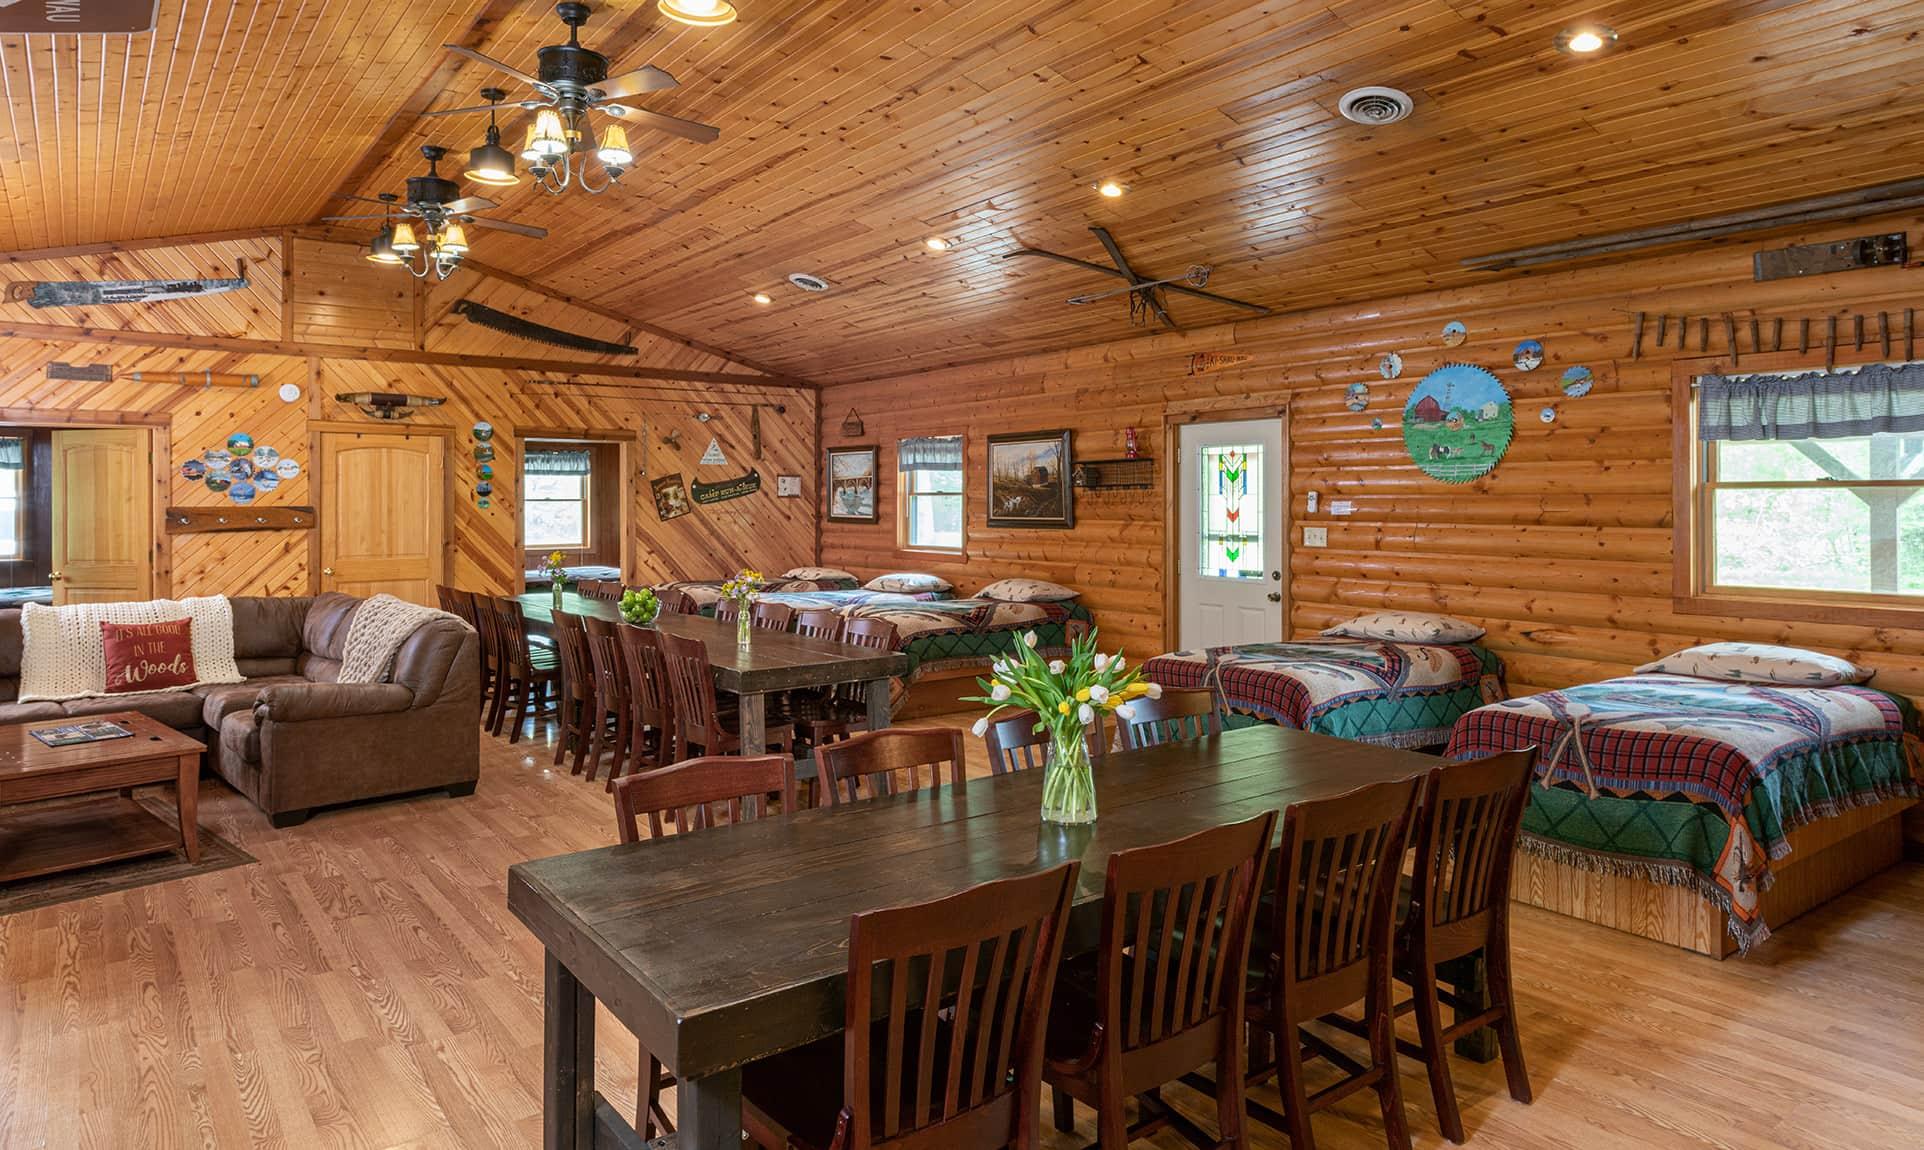 Grandma's Cabin main room for family friendly lodging near Chicago